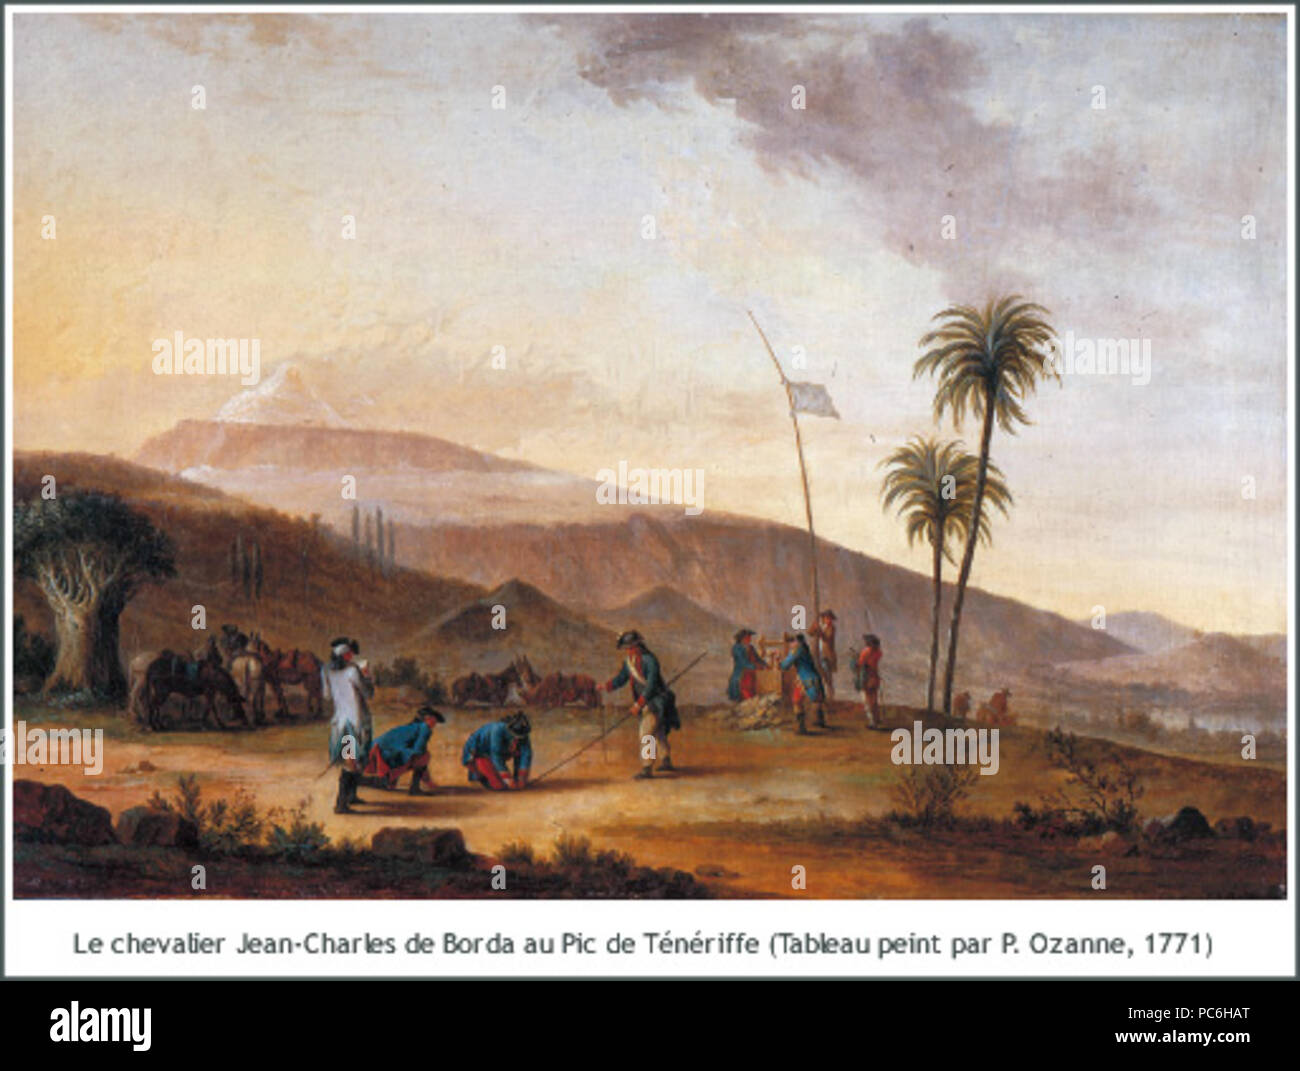 48 Jean-Charles de Borda mesurant le Pic de Ténériffe (1771)